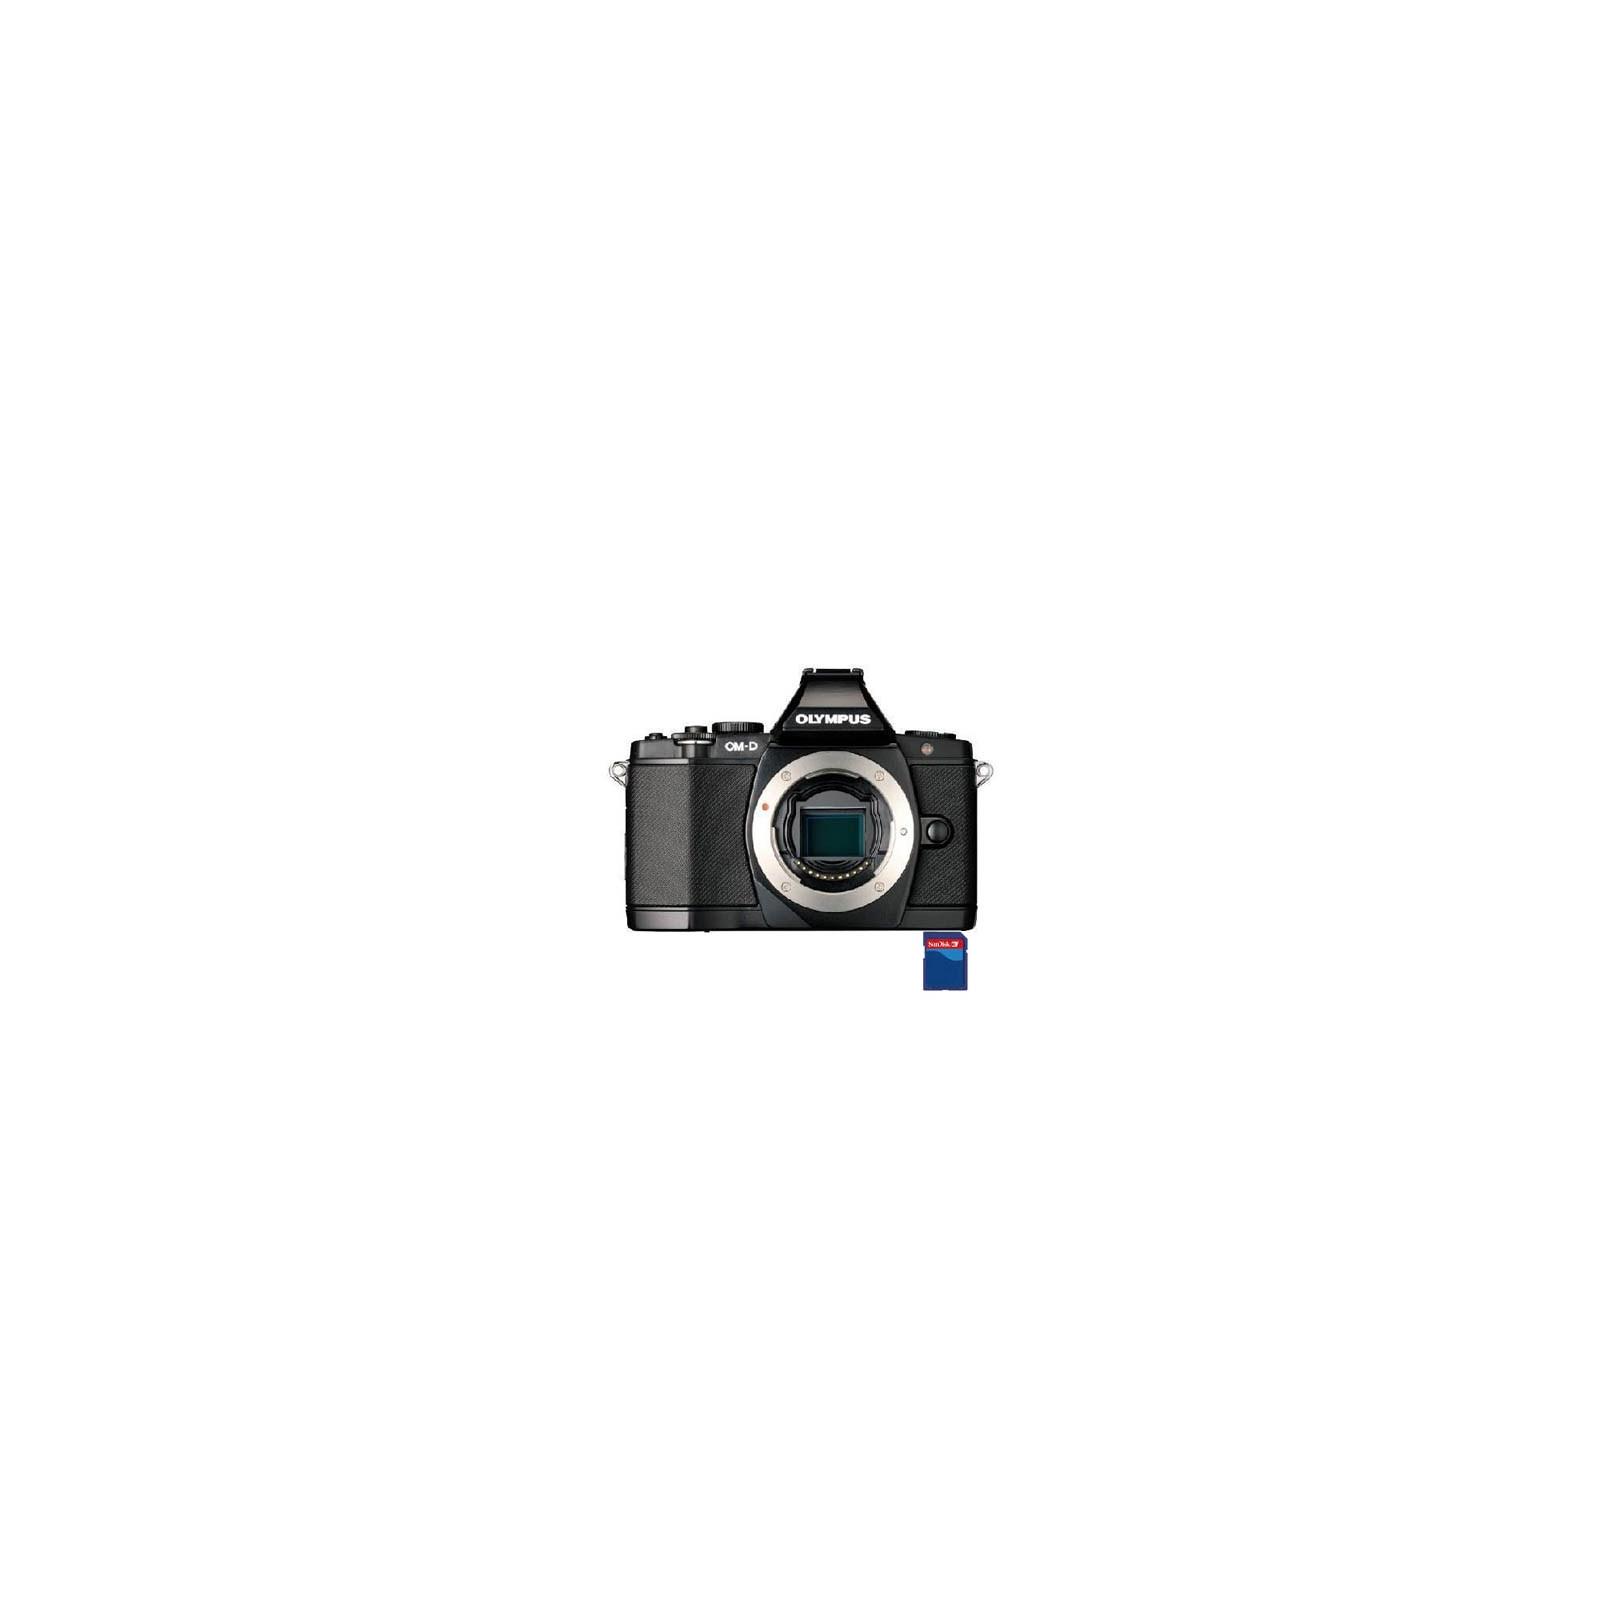 Цифровой фотоаппарат OLYMPUS OM-D E-M5 body black (V204040BE000)